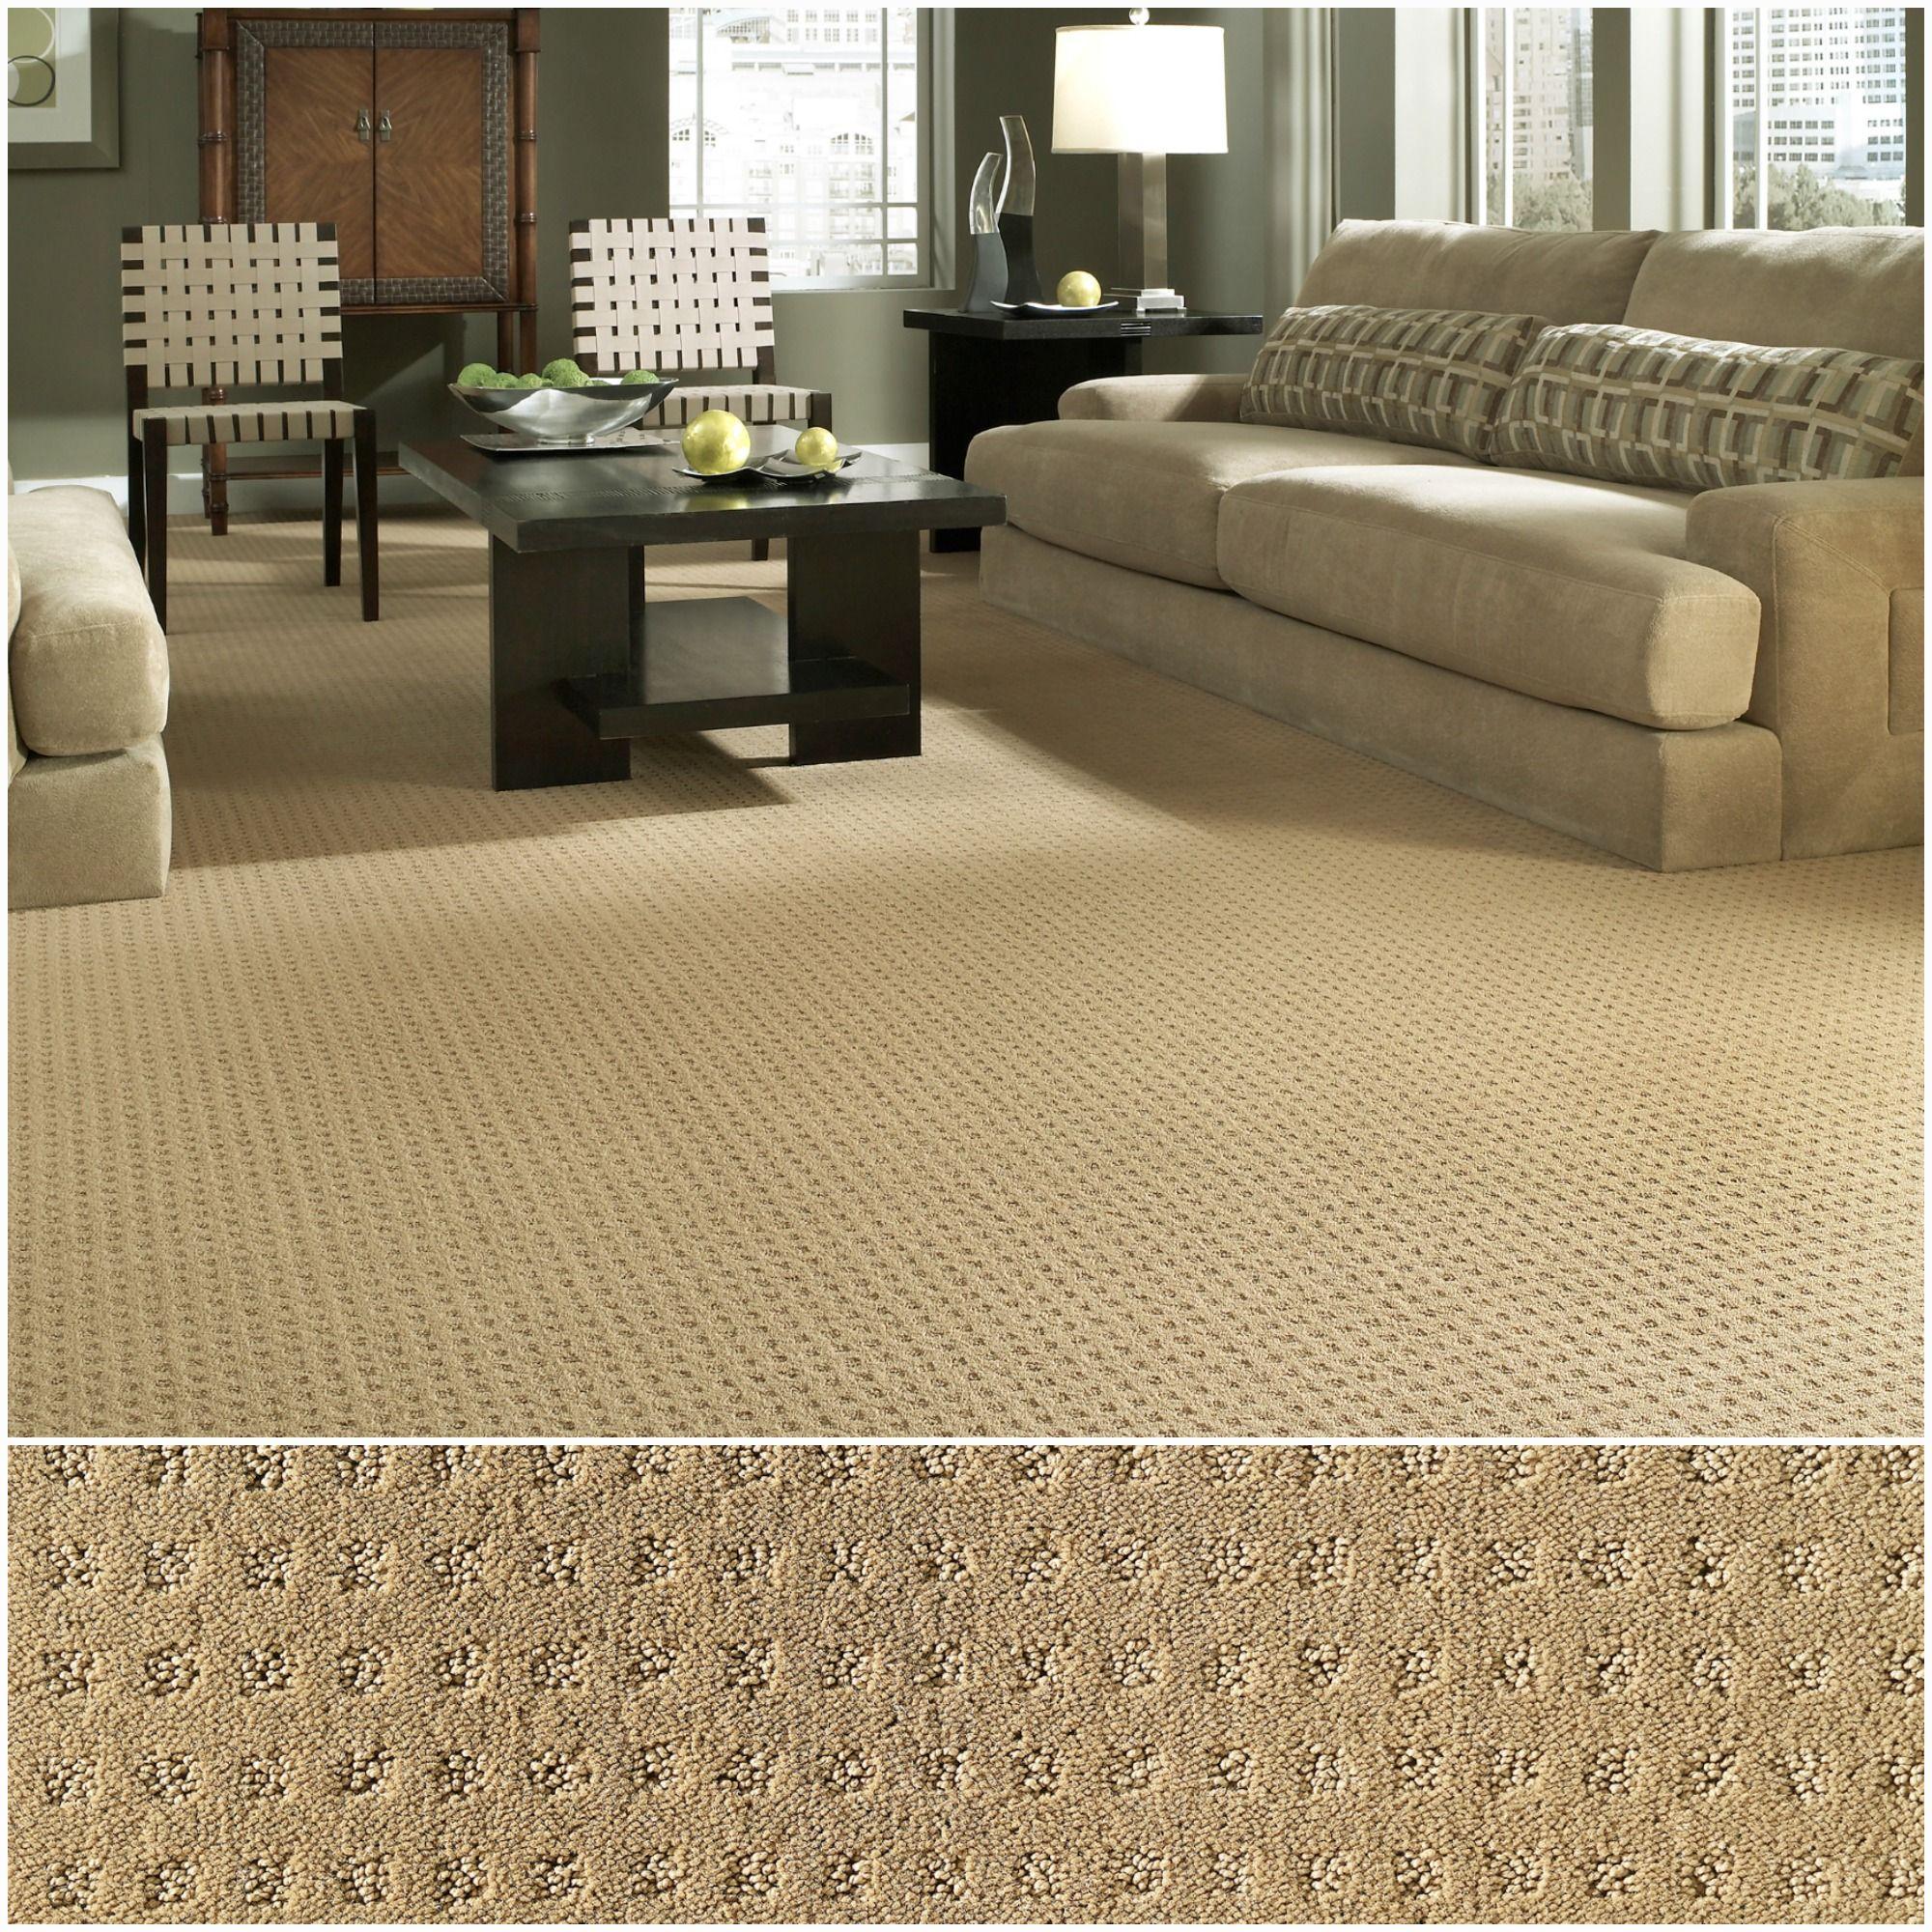 Mission Square Z6781 00223 Carpet Flooring Anderson Tuftex Textured Carpet Carpet Flooring Inspiration